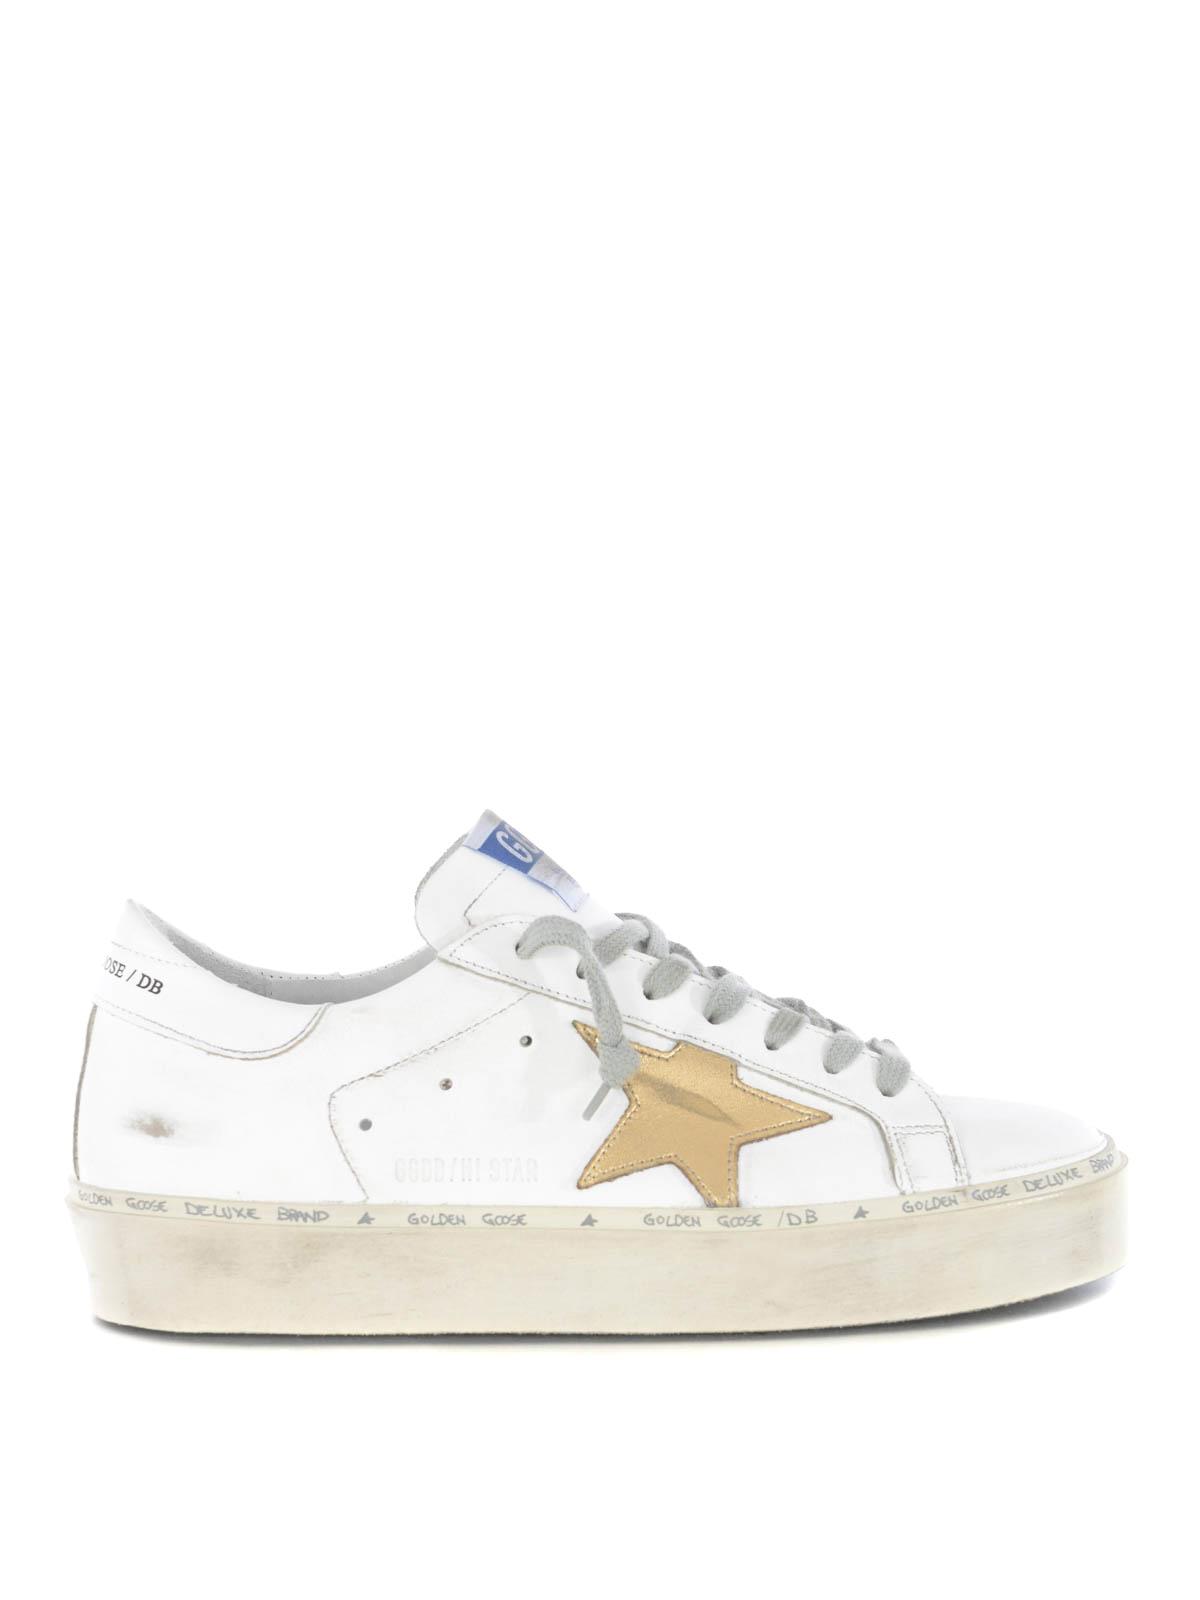 8a1fe8710a Golden Goose - Sneaker Hi Star con stella dorata - sneakers ...